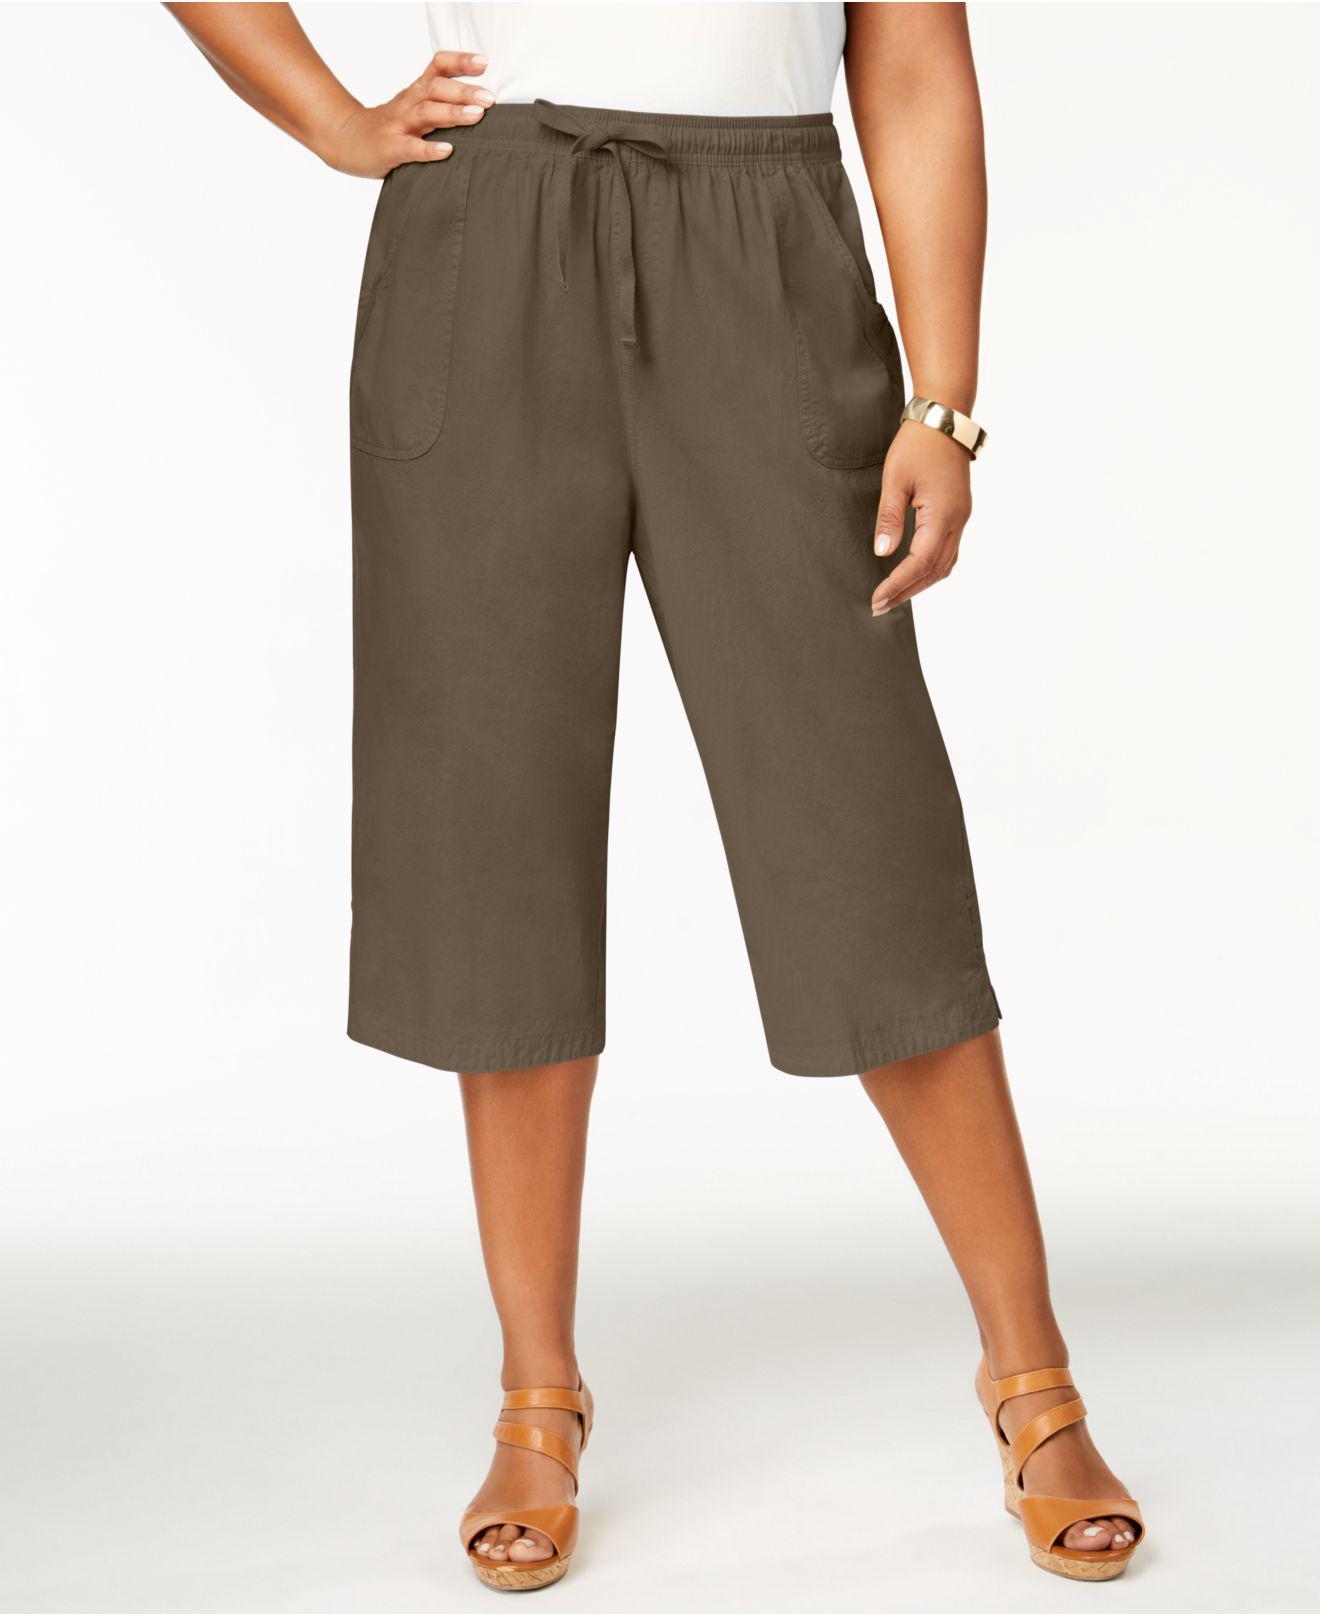 dcd8cf00d3f35 Lyst - Karen Scott Plus Size Cotton Drawstring Capri Pants